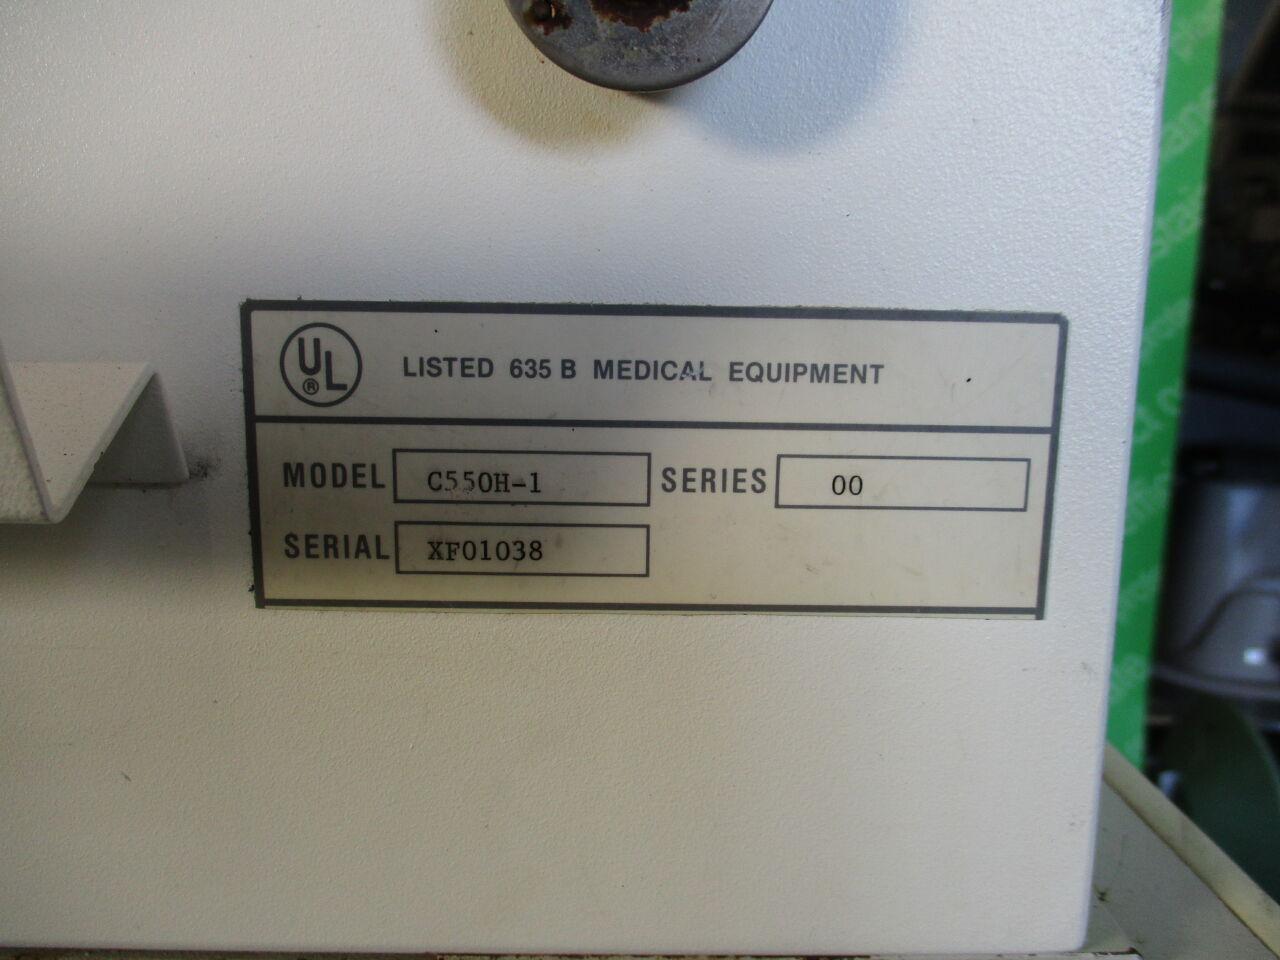 HILL ROM Air Shields Isolette C550H-1  Infant Incubator